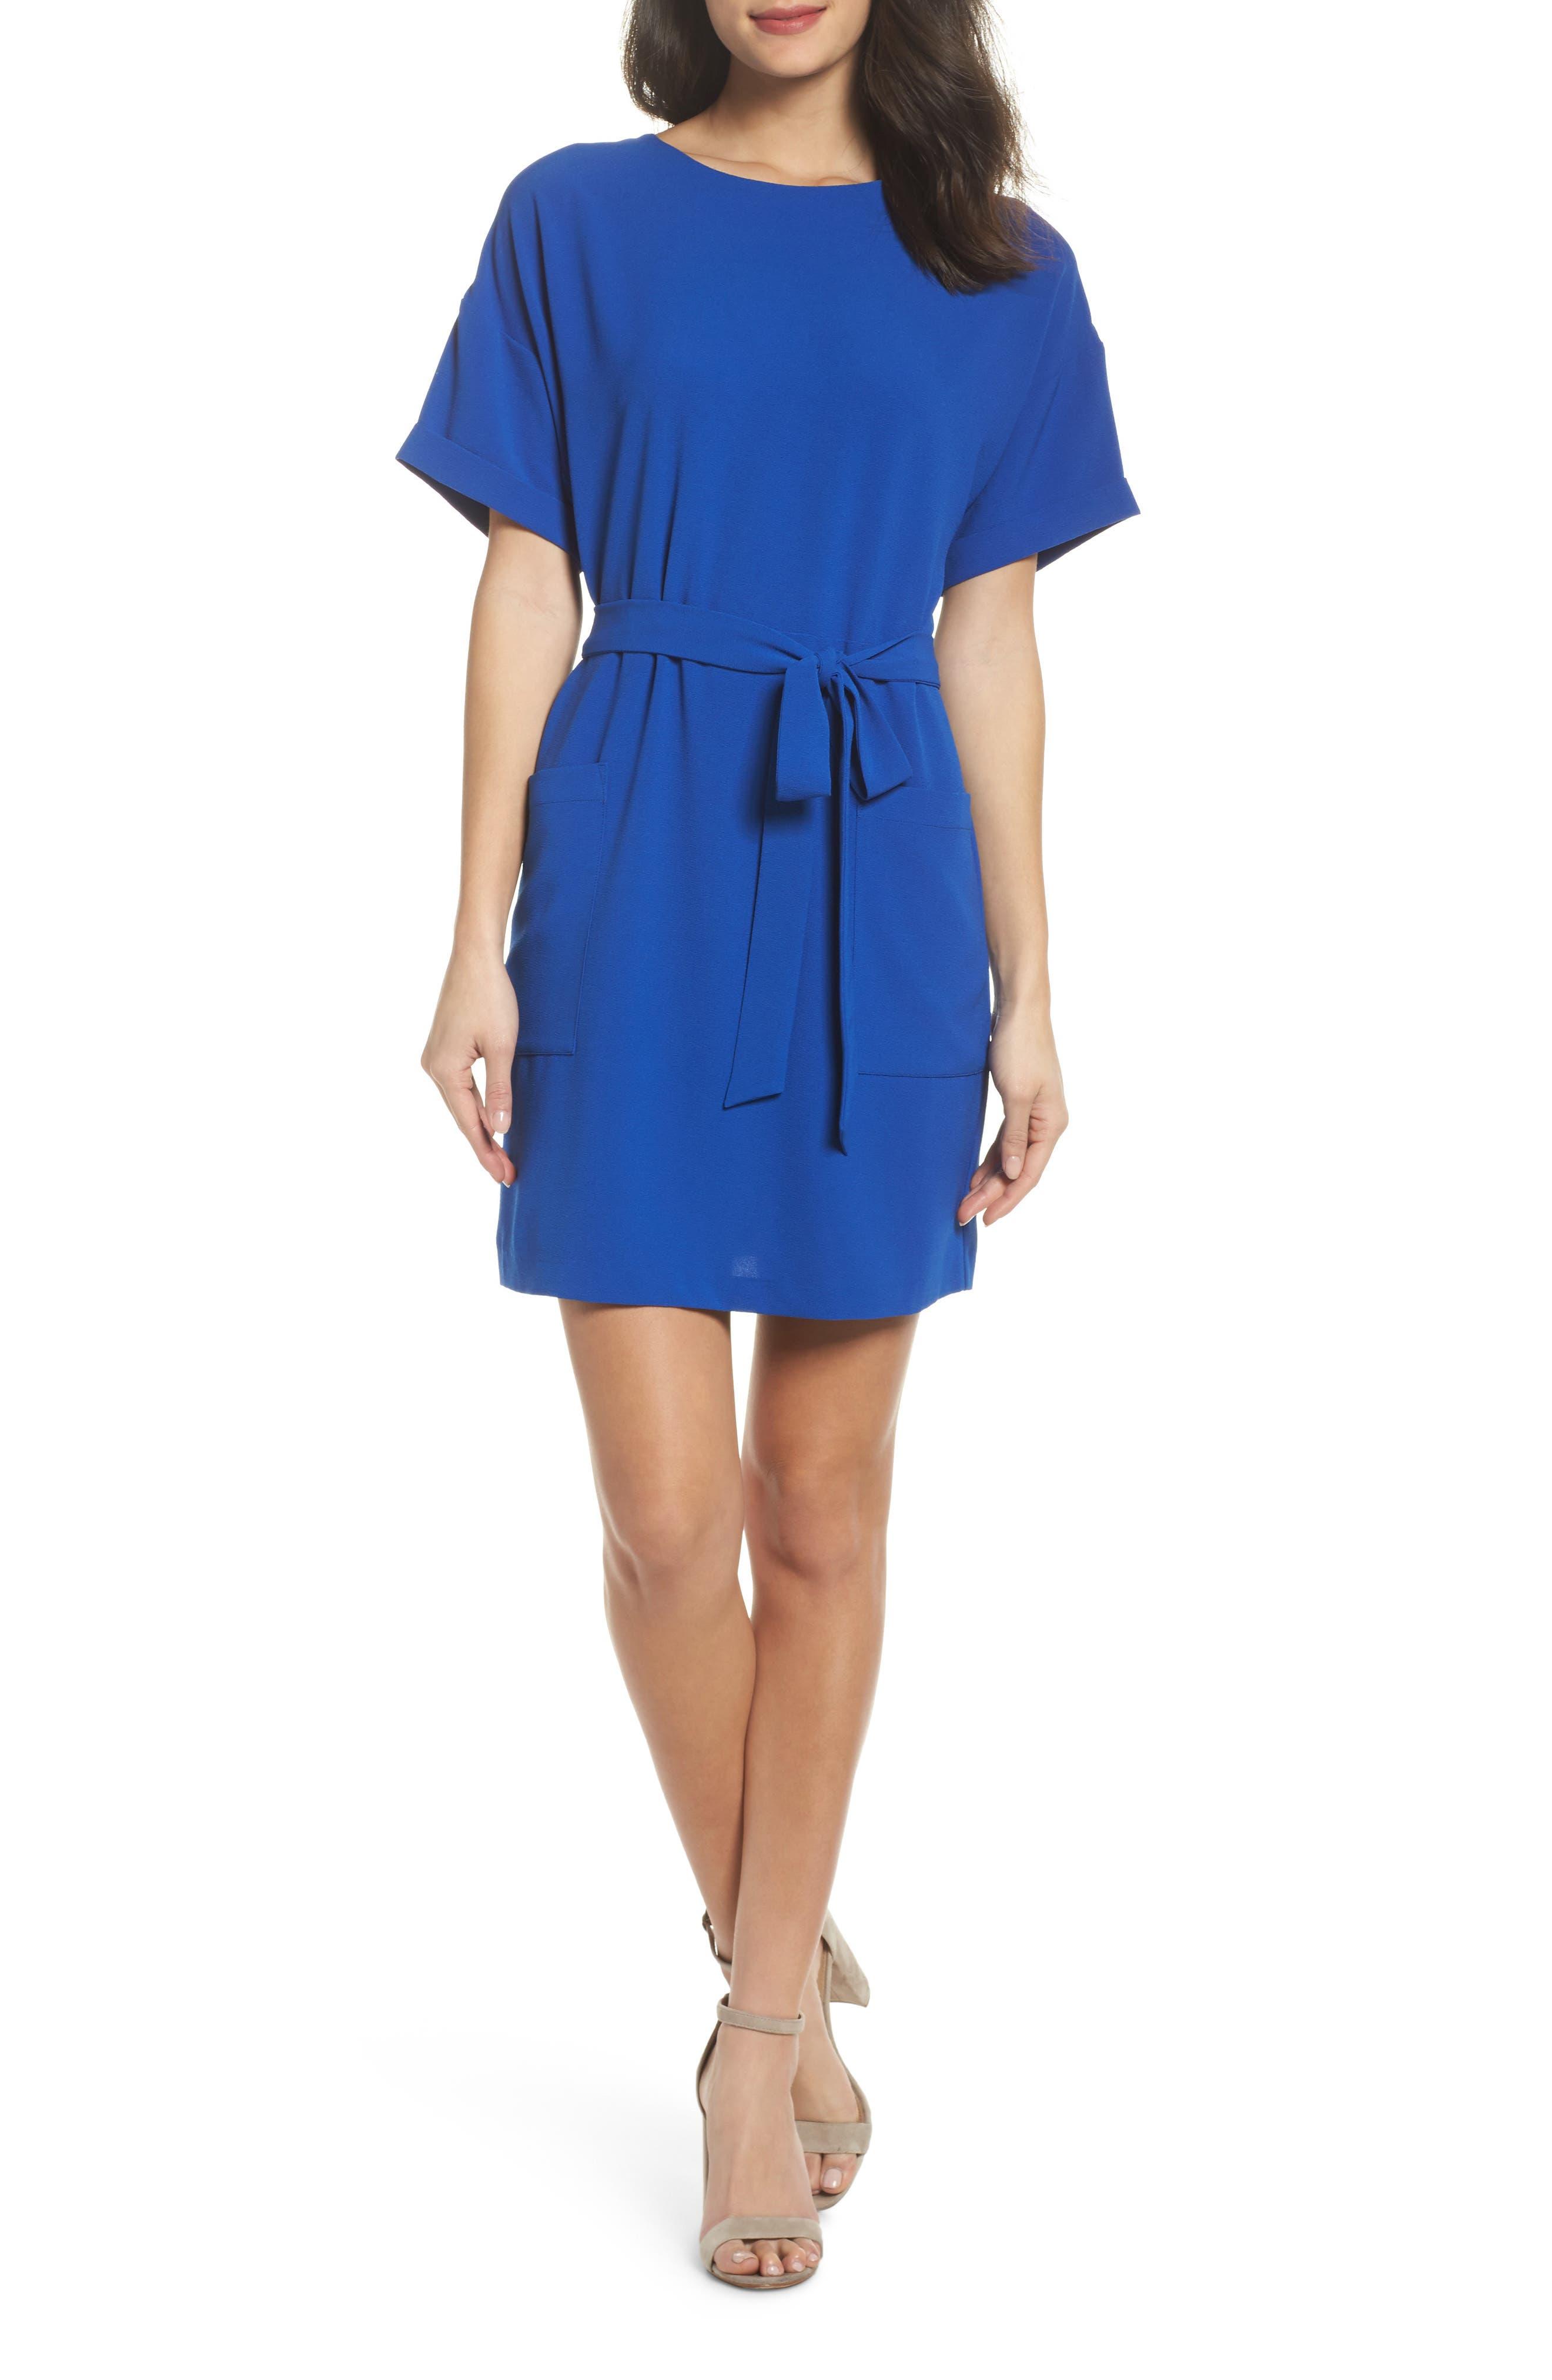 Alternate Image 1 Selected - Felicity & Coco Halia Tie Waist Dress (Regular & Petite)